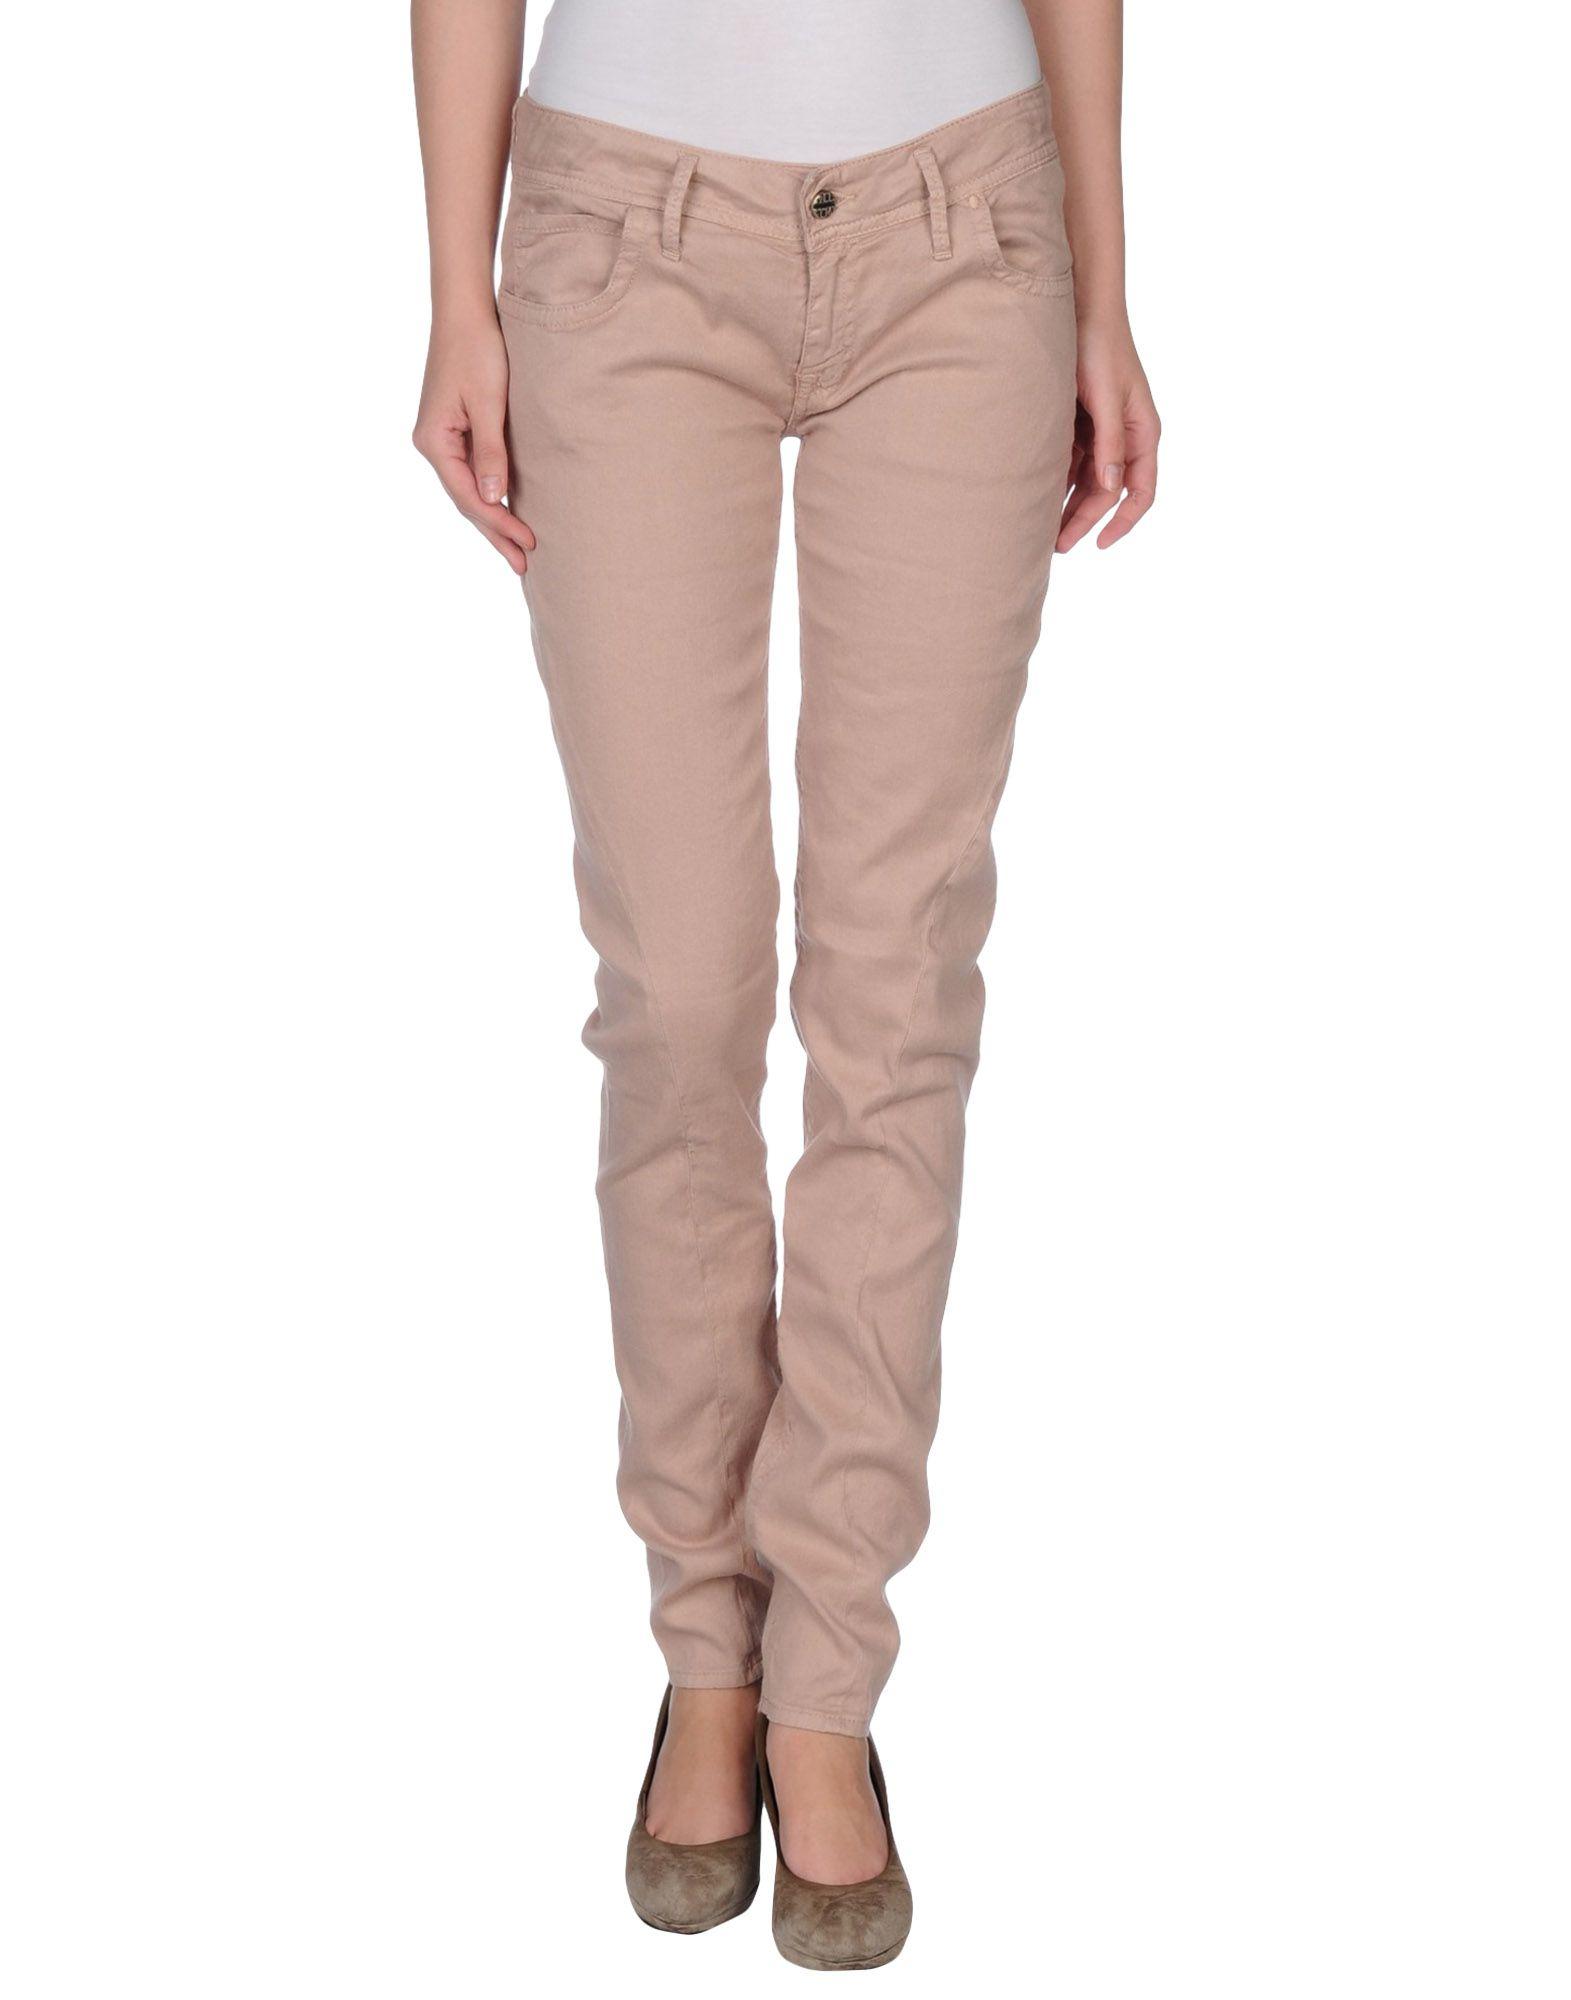 Cycle Denim Pants in Beige (Skin color) - Save 85% | Lyst